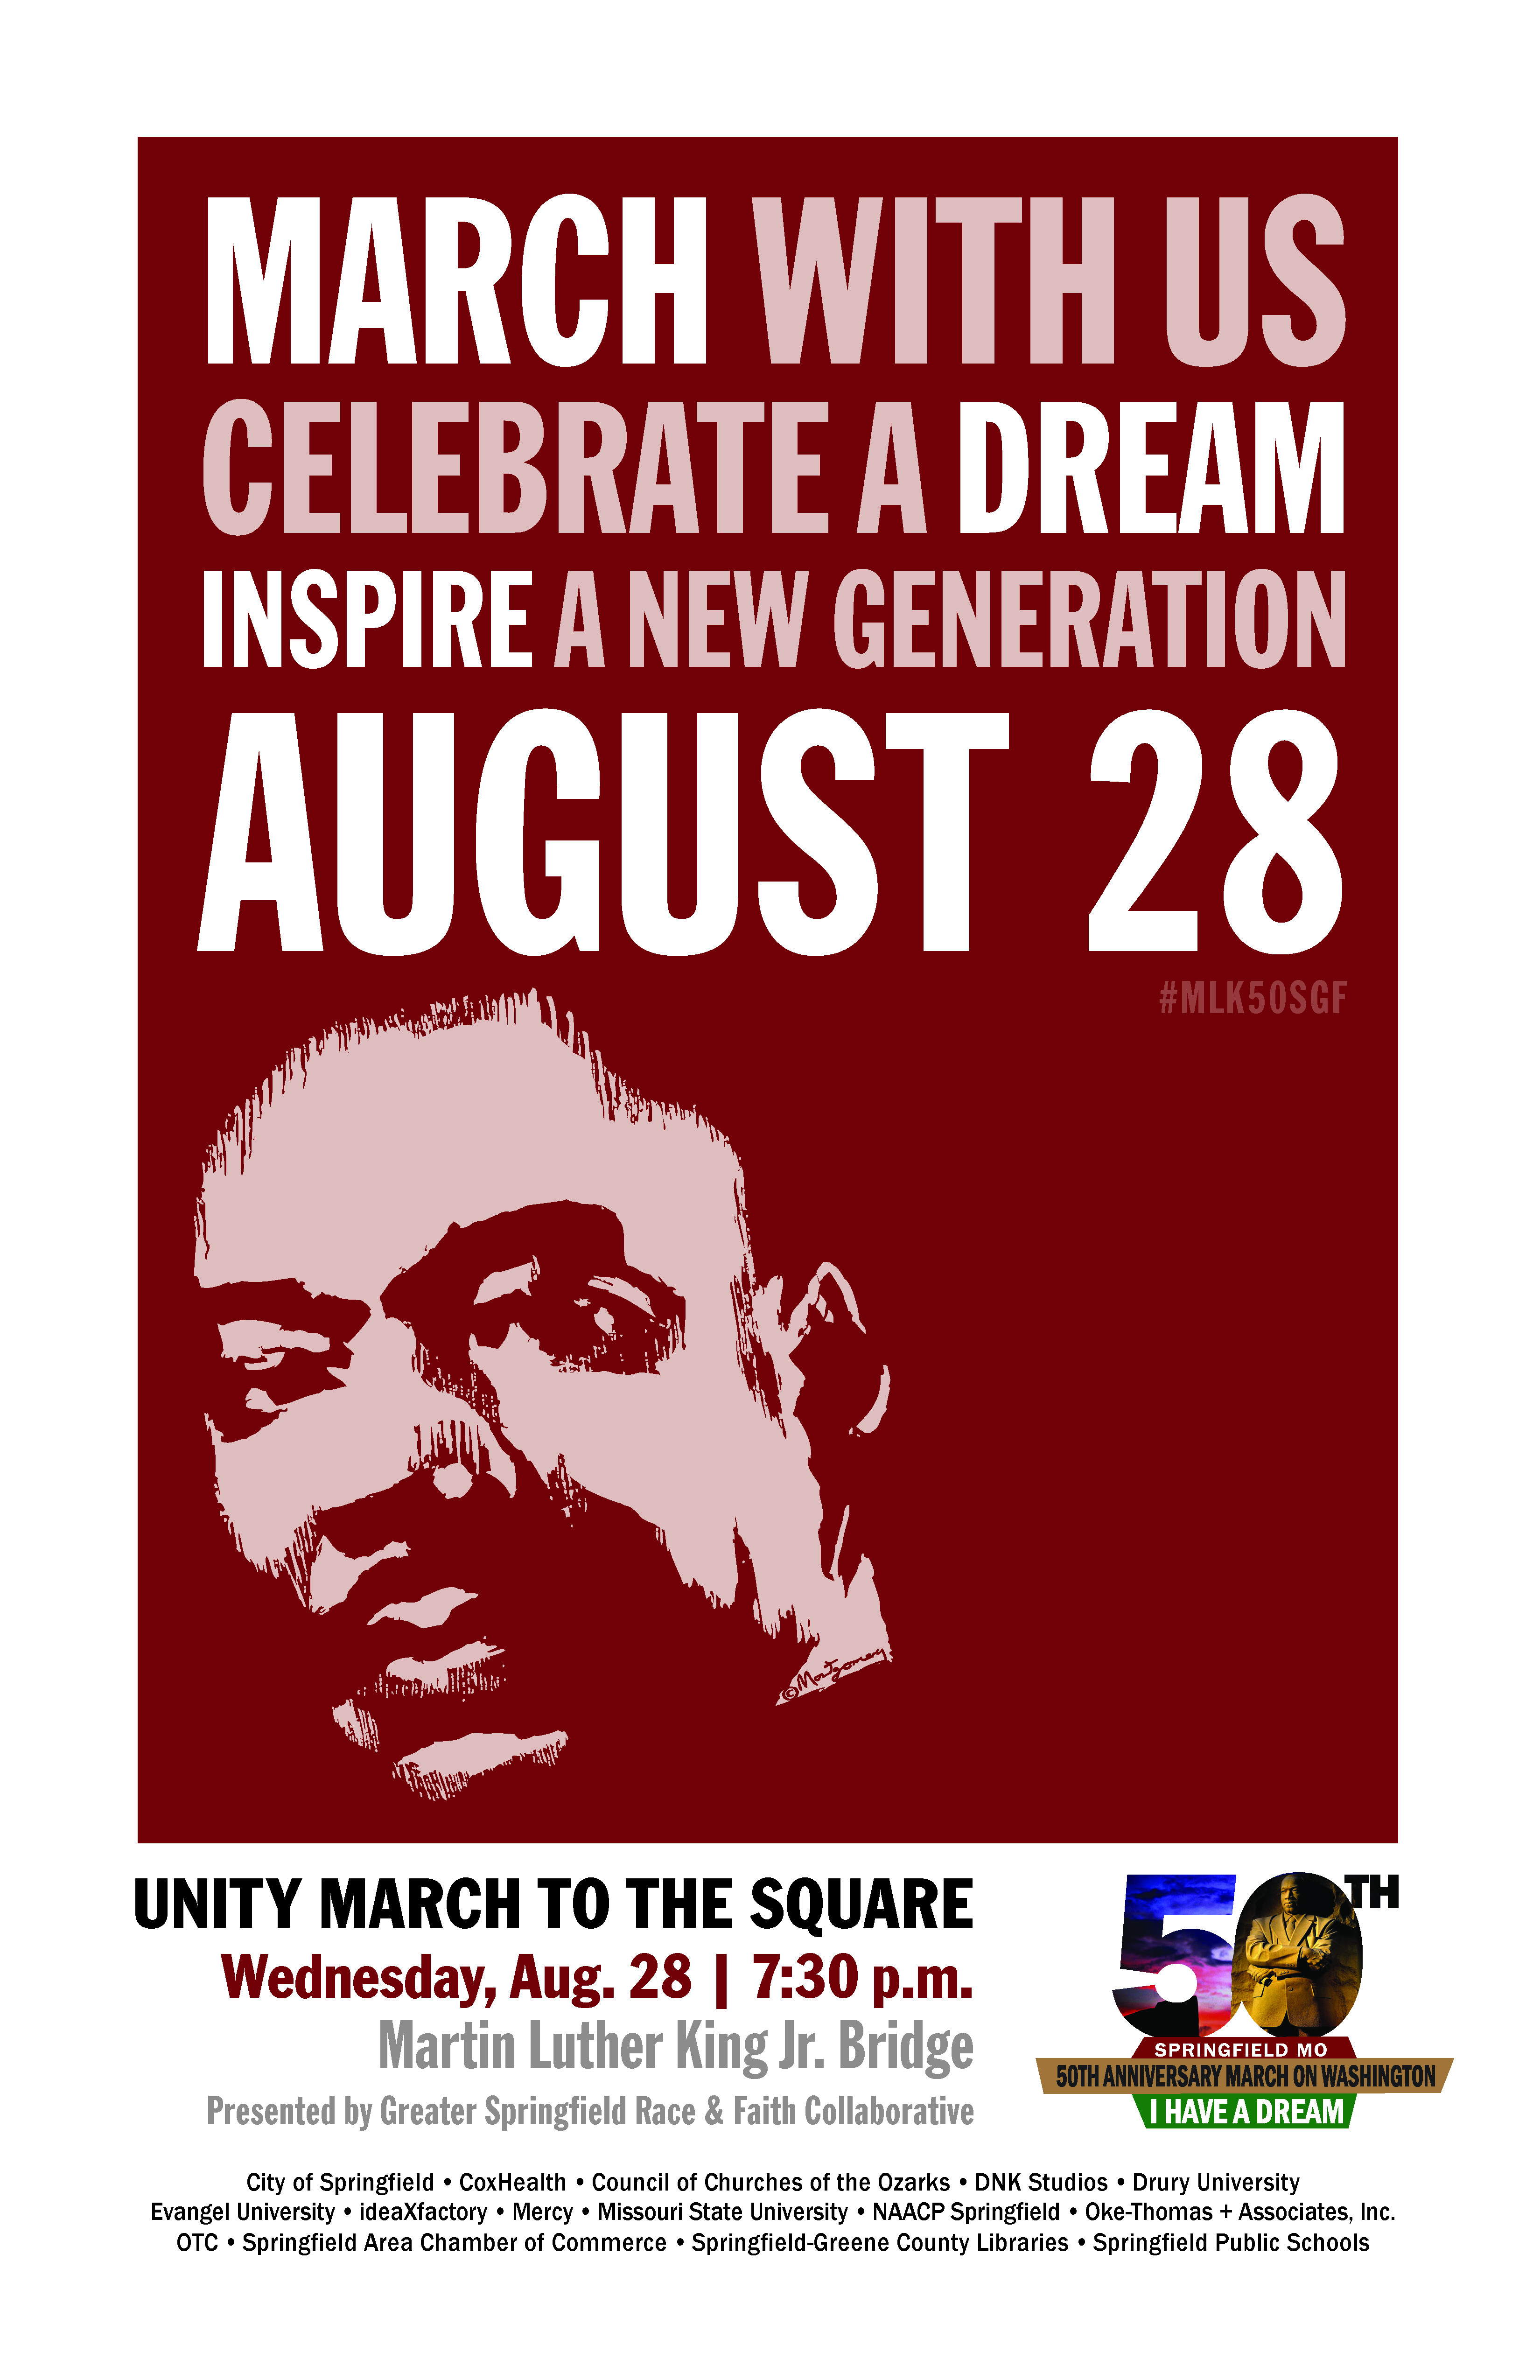 MLK Unity March Wednesday!